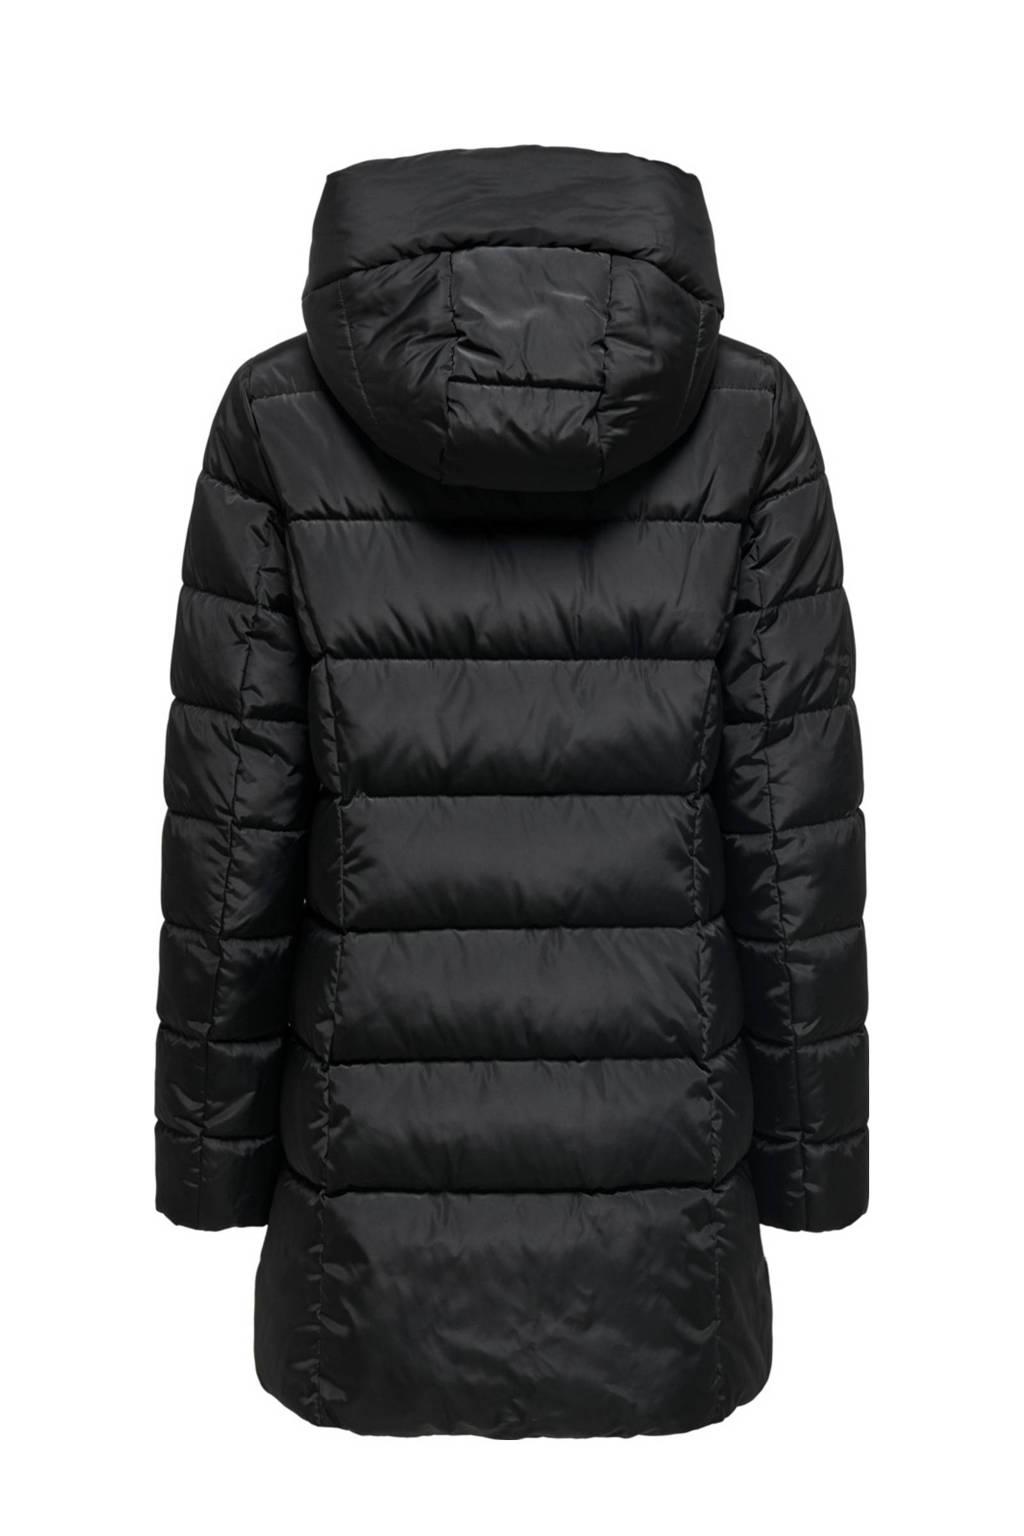 ONLY gewatteerde jas zwart, Zwart